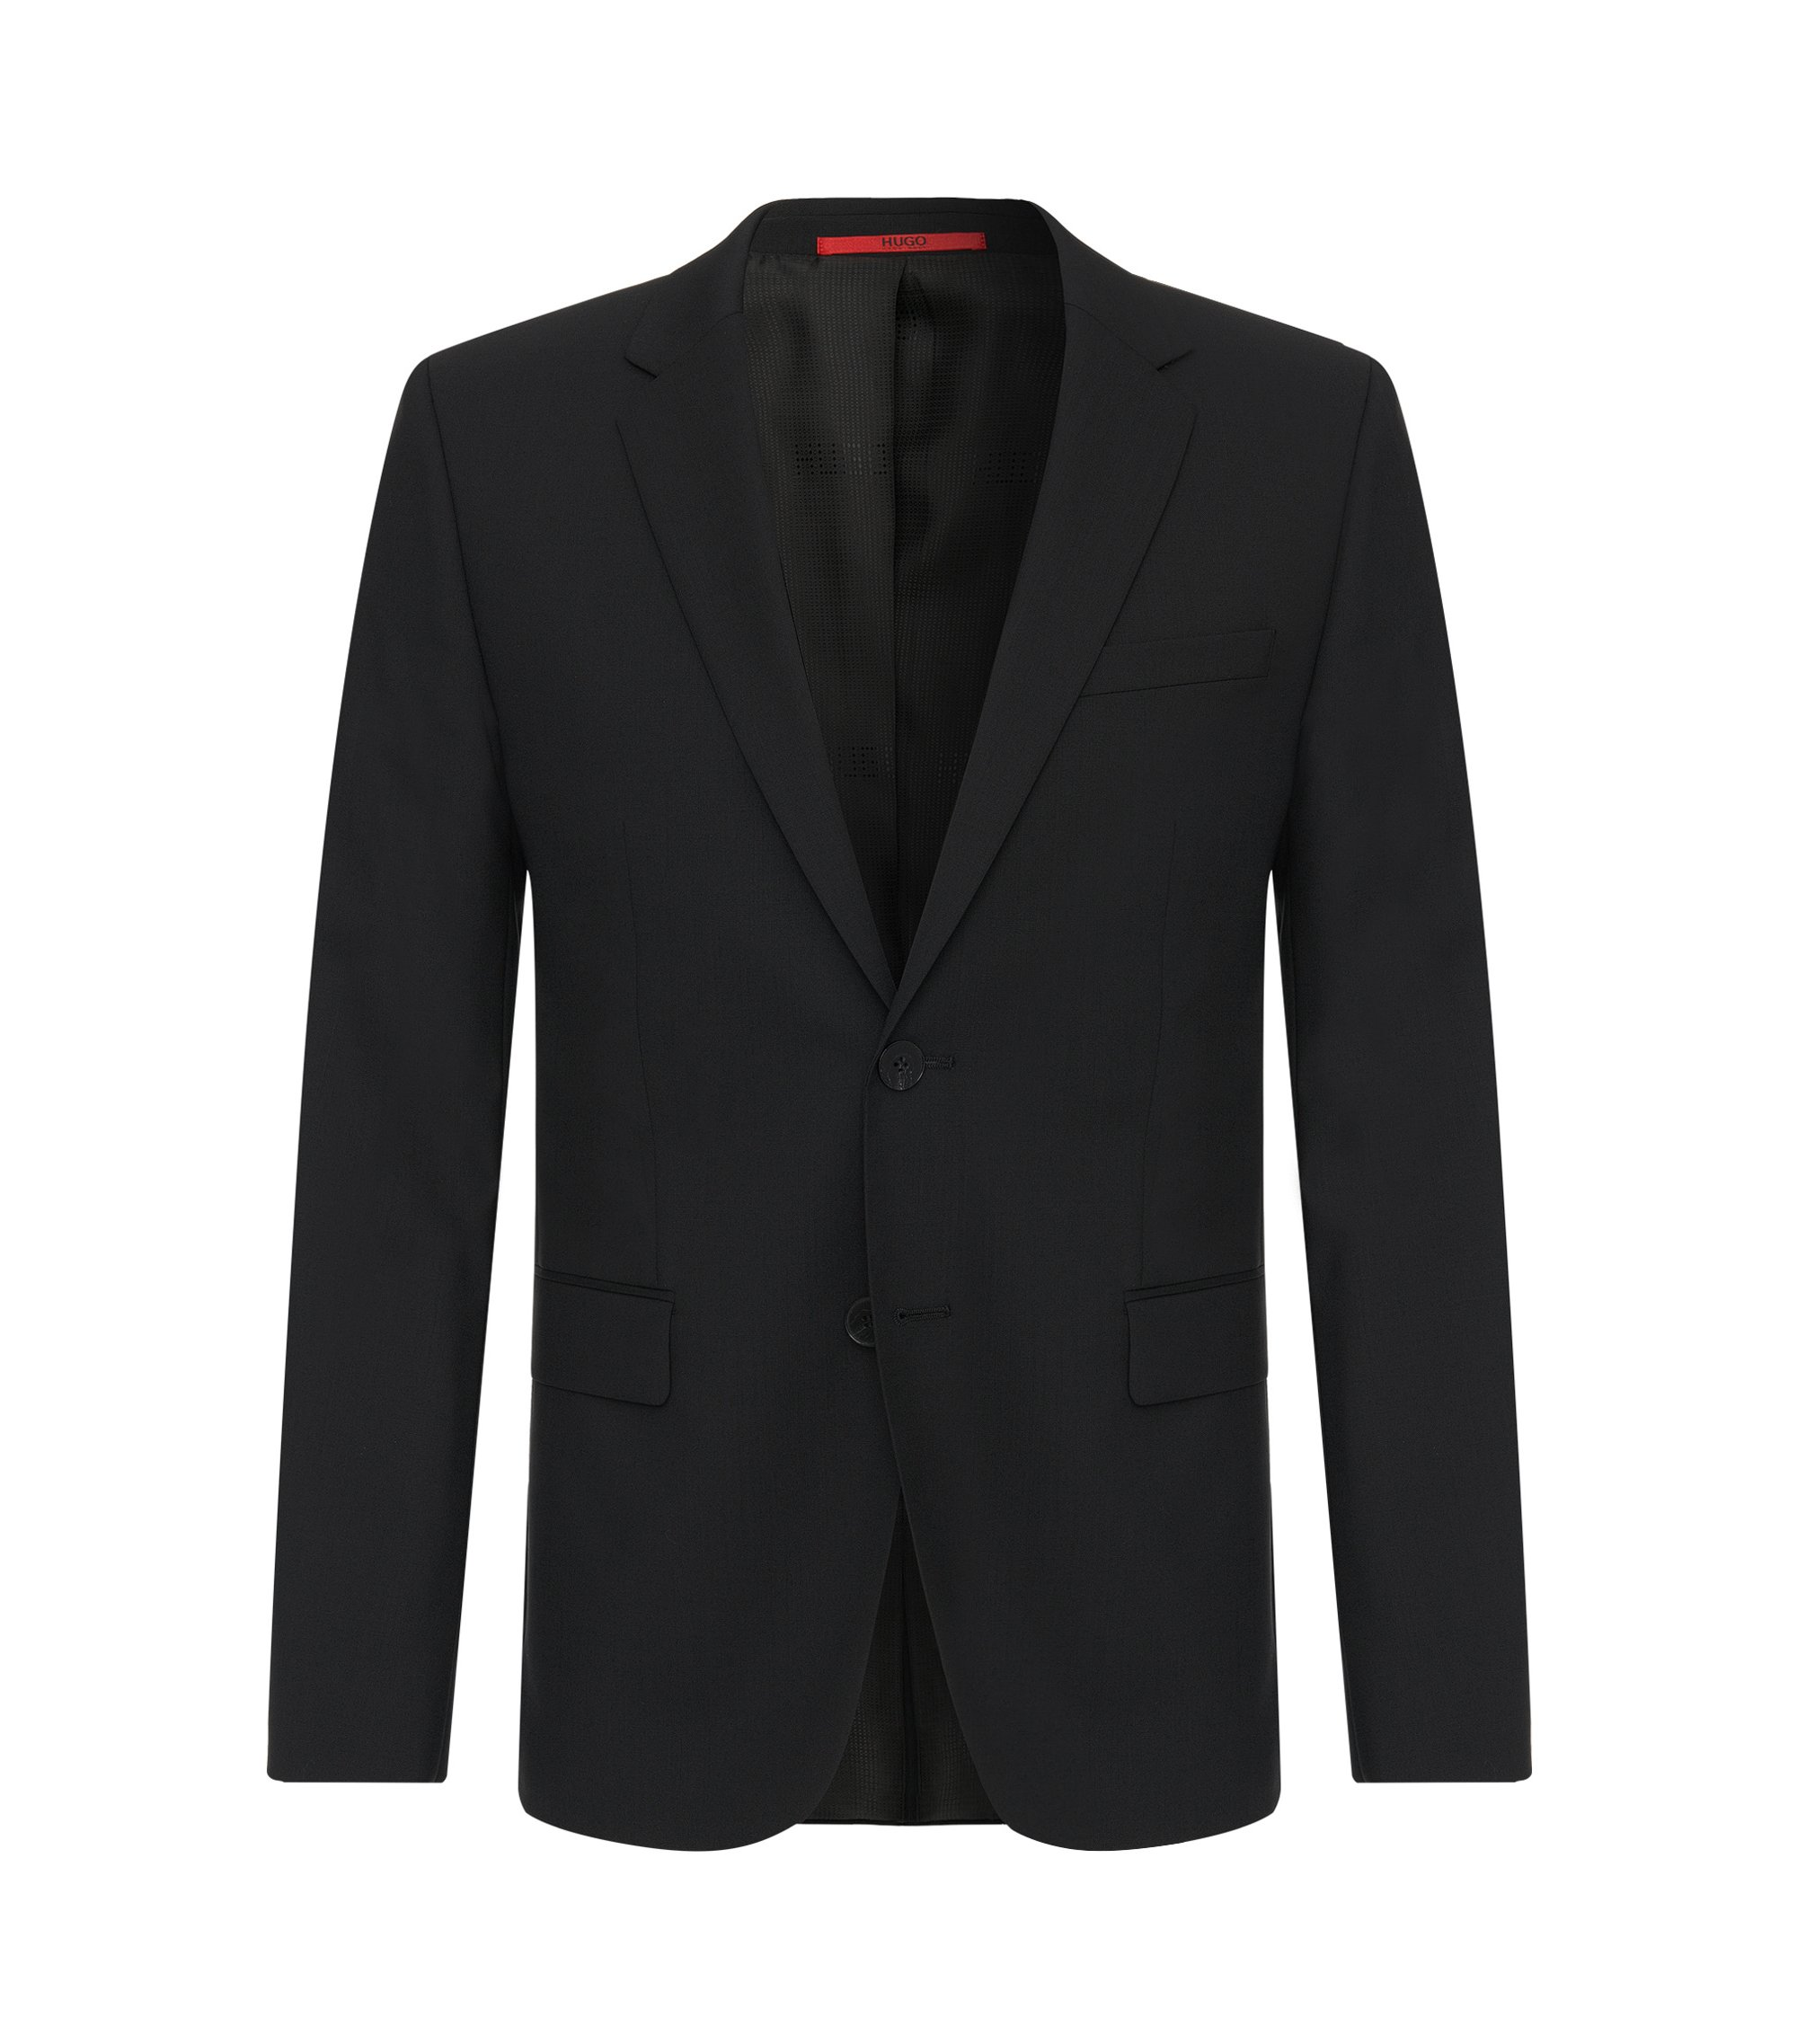 Giacca slim fit in lana elasticizzata HUGO Uomo, Nero